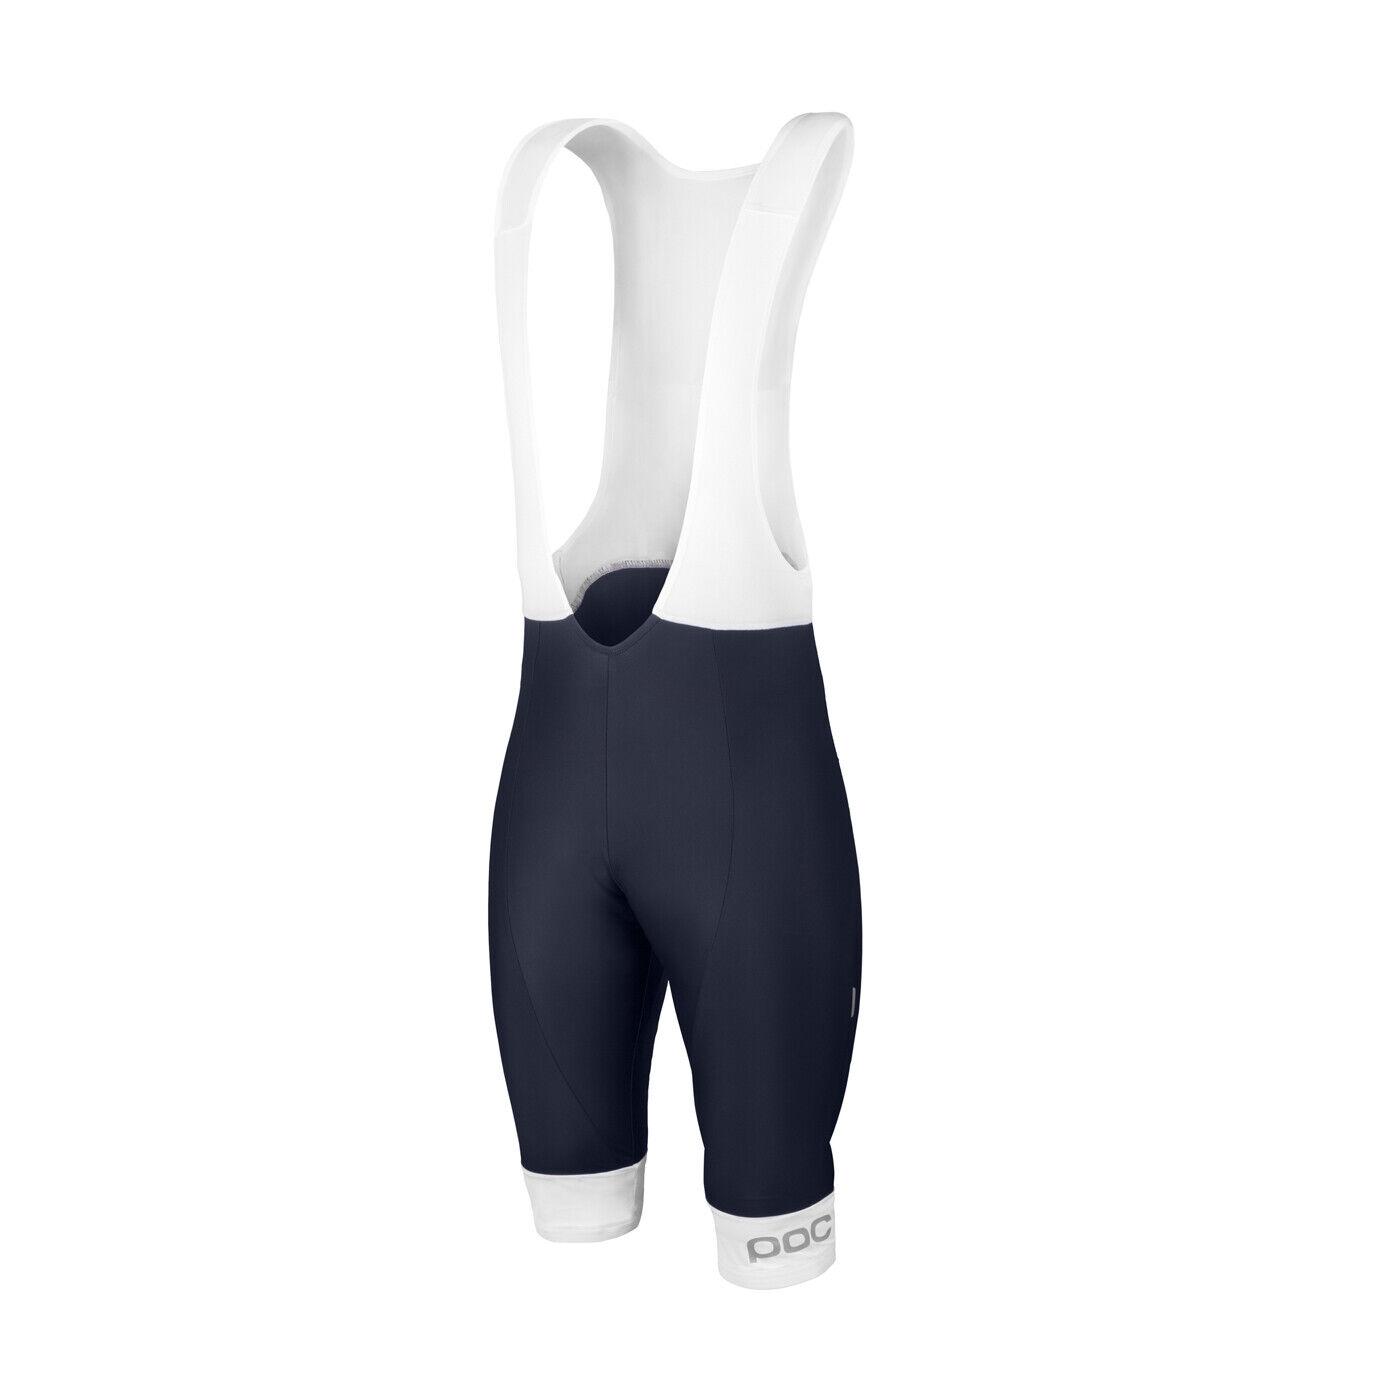 POC Multi D 3 4 Mono Pantalones Cortos-Color  Azul Marino Negro hidrógeno blancoo-Tamaño  S Azul Marino